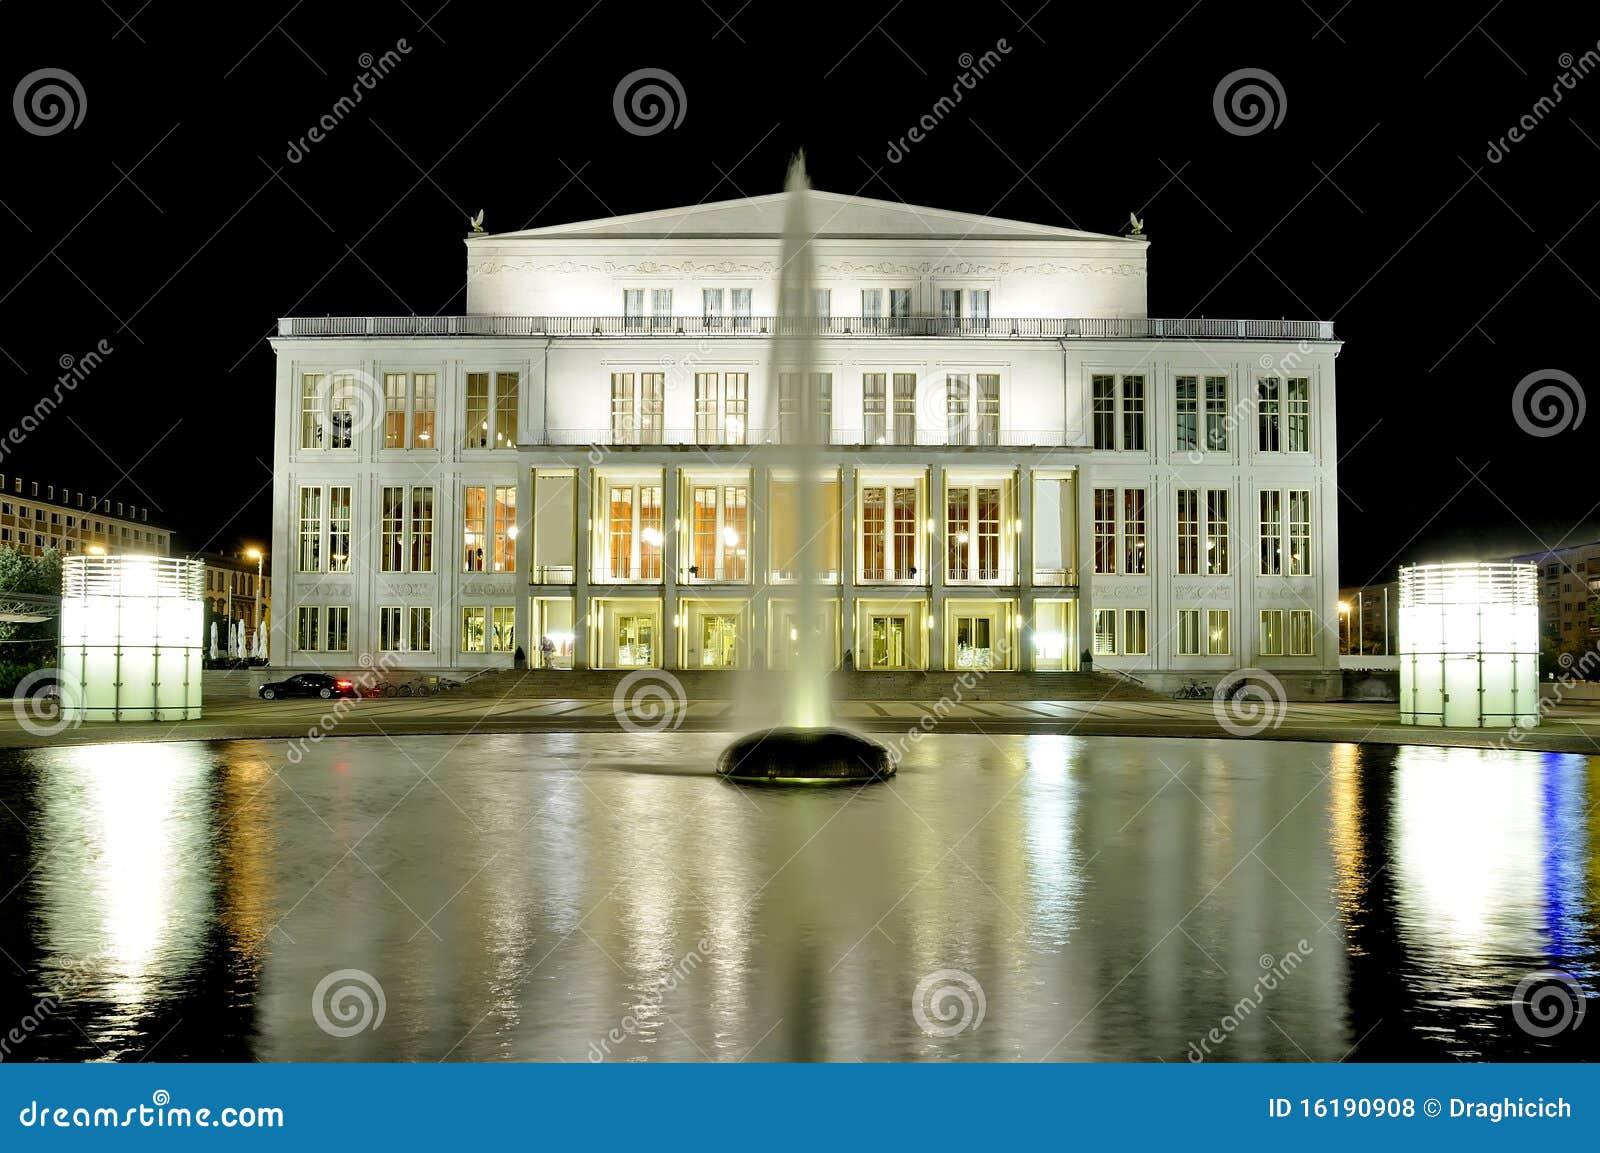 Opera House In Leipzig At Night Stock Photo Image Of Platz Opernhaus 16190908